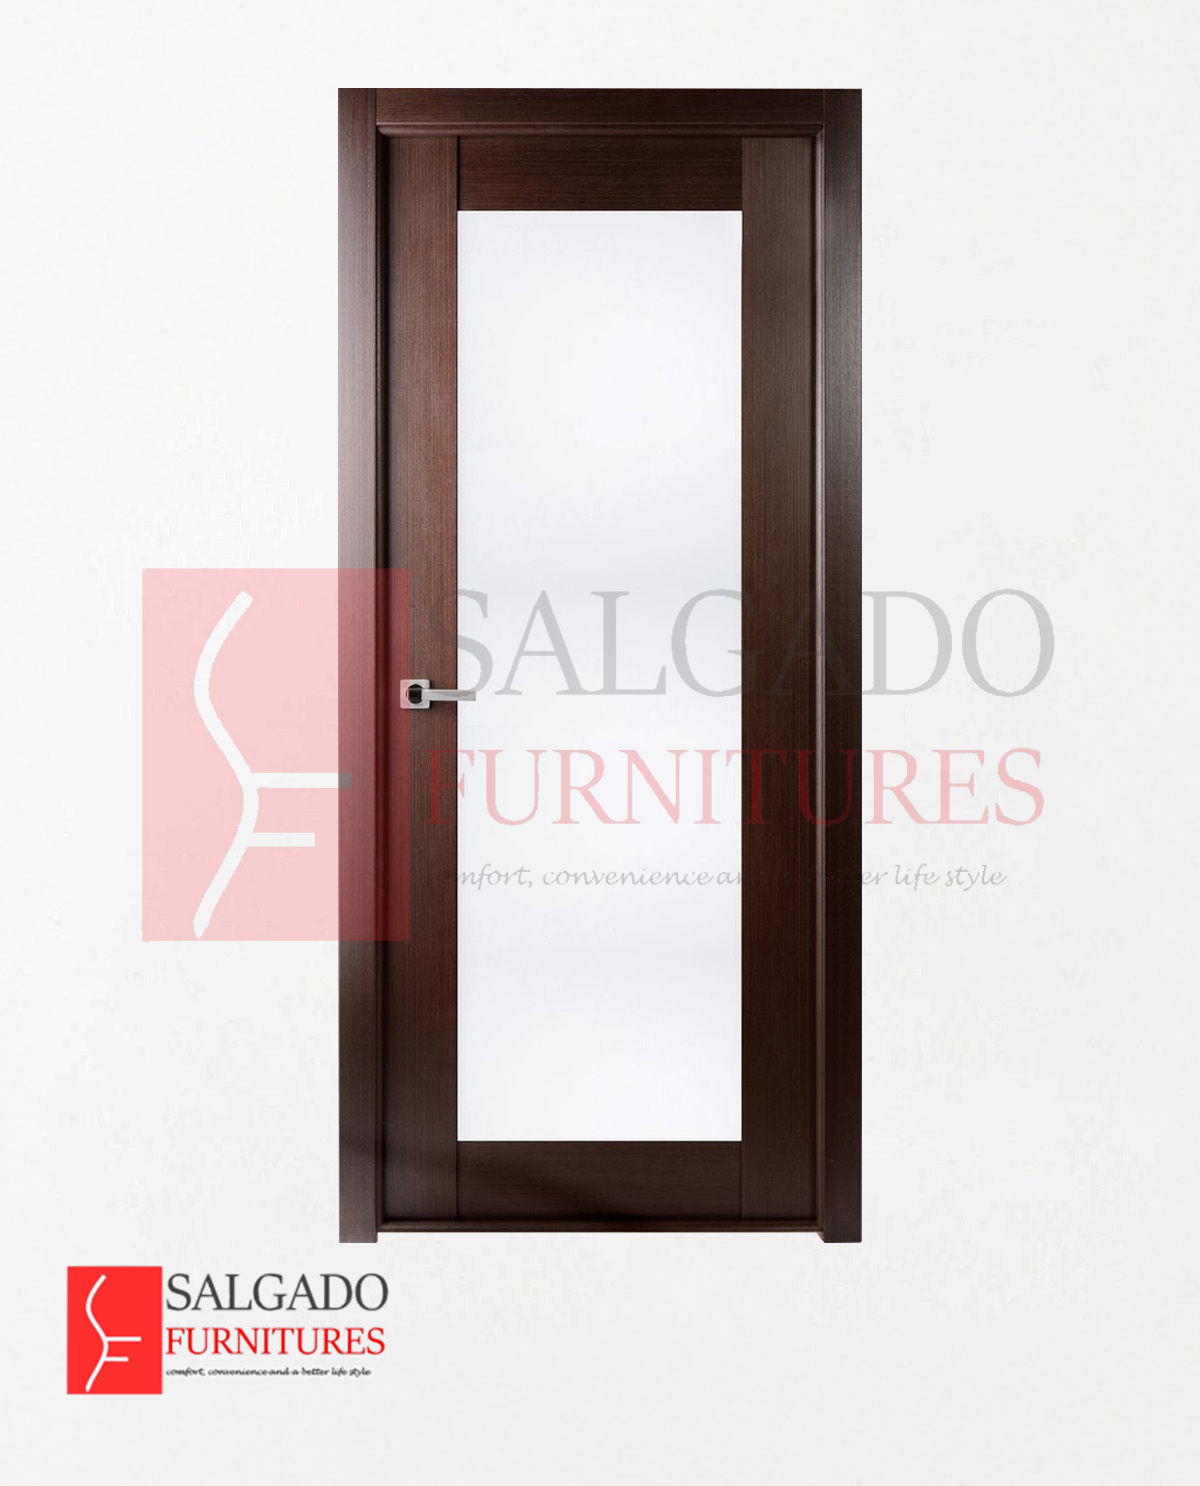 teakwood-glassdoors-forsale